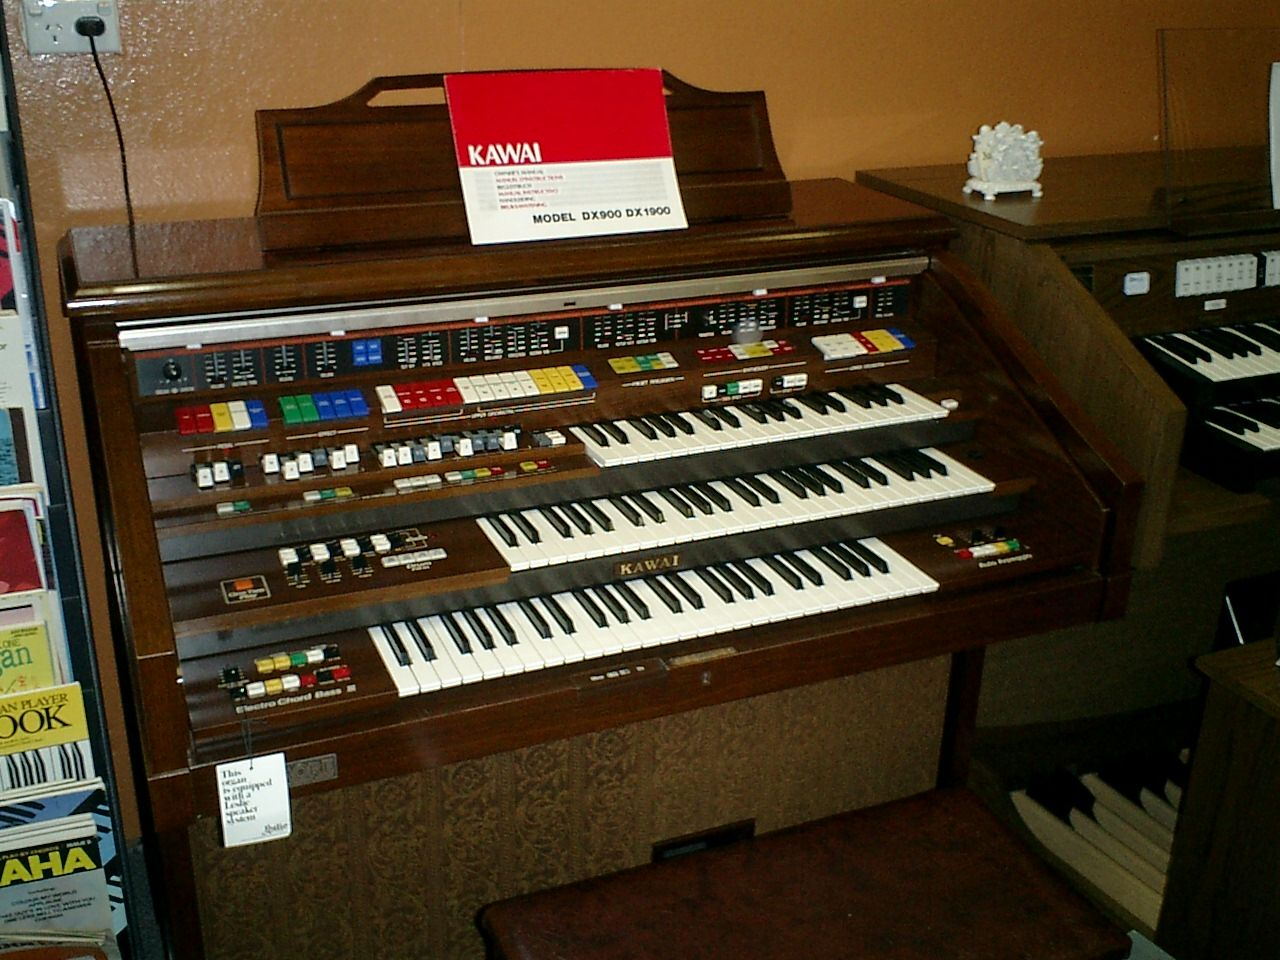 Kawai Dx900 Organ This Electronic Spinet Organ In